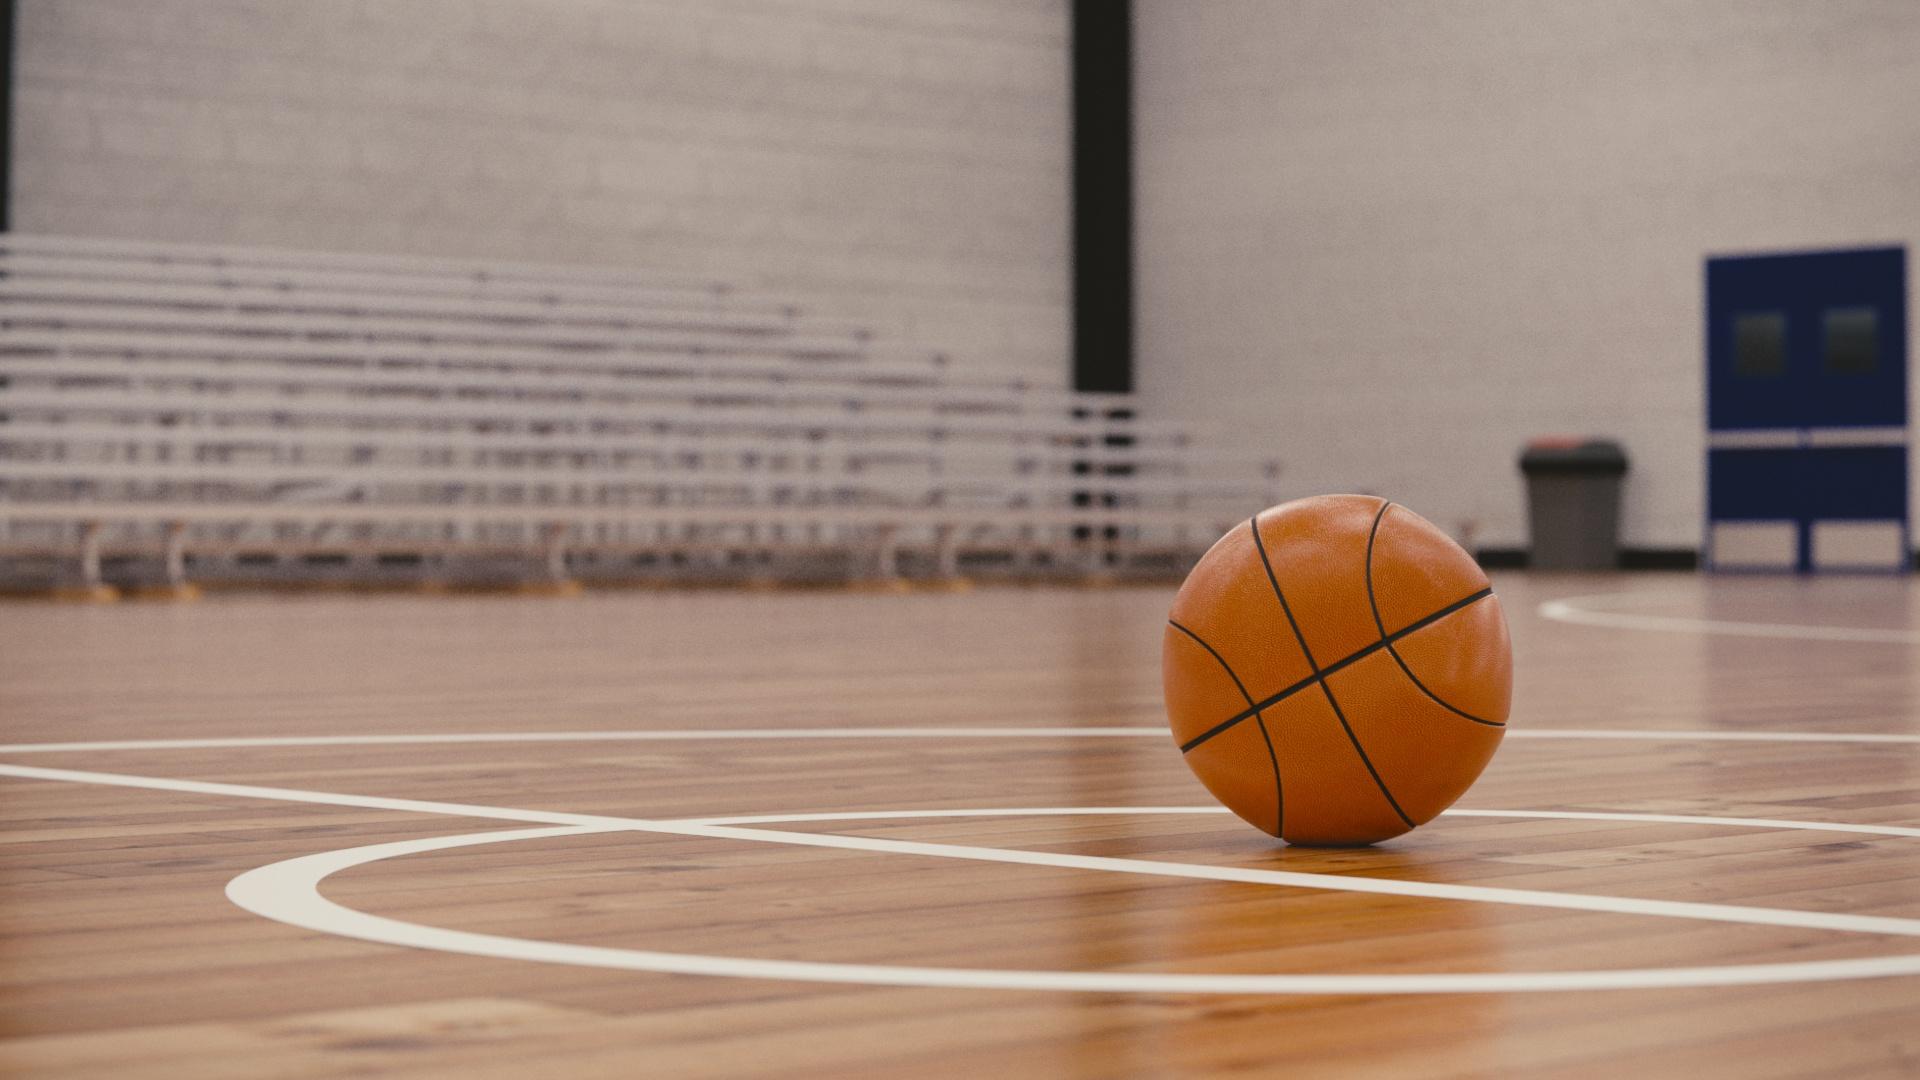 Basketball free pic